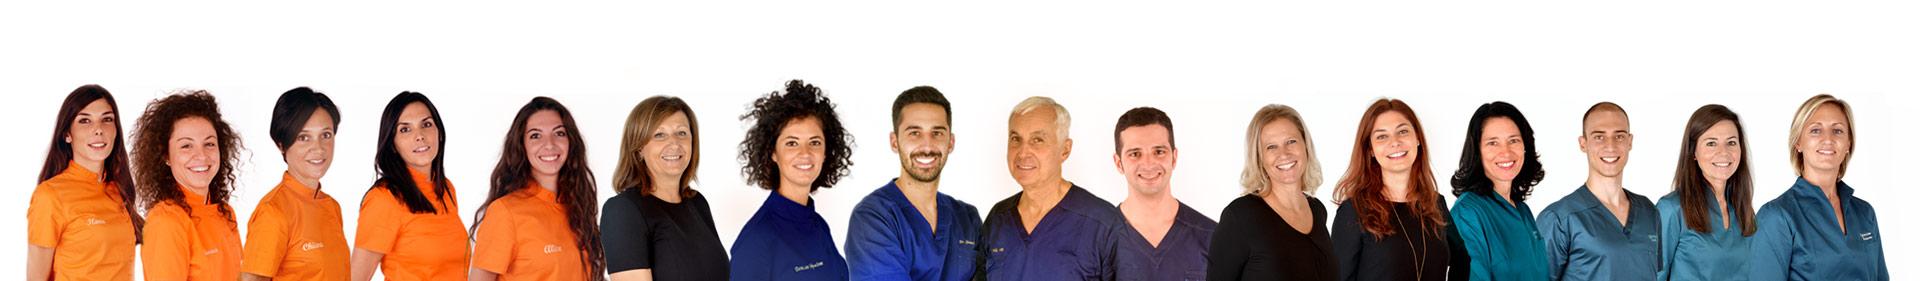 Team | Dentista a Montagnana | Clinica dentale Mantoan